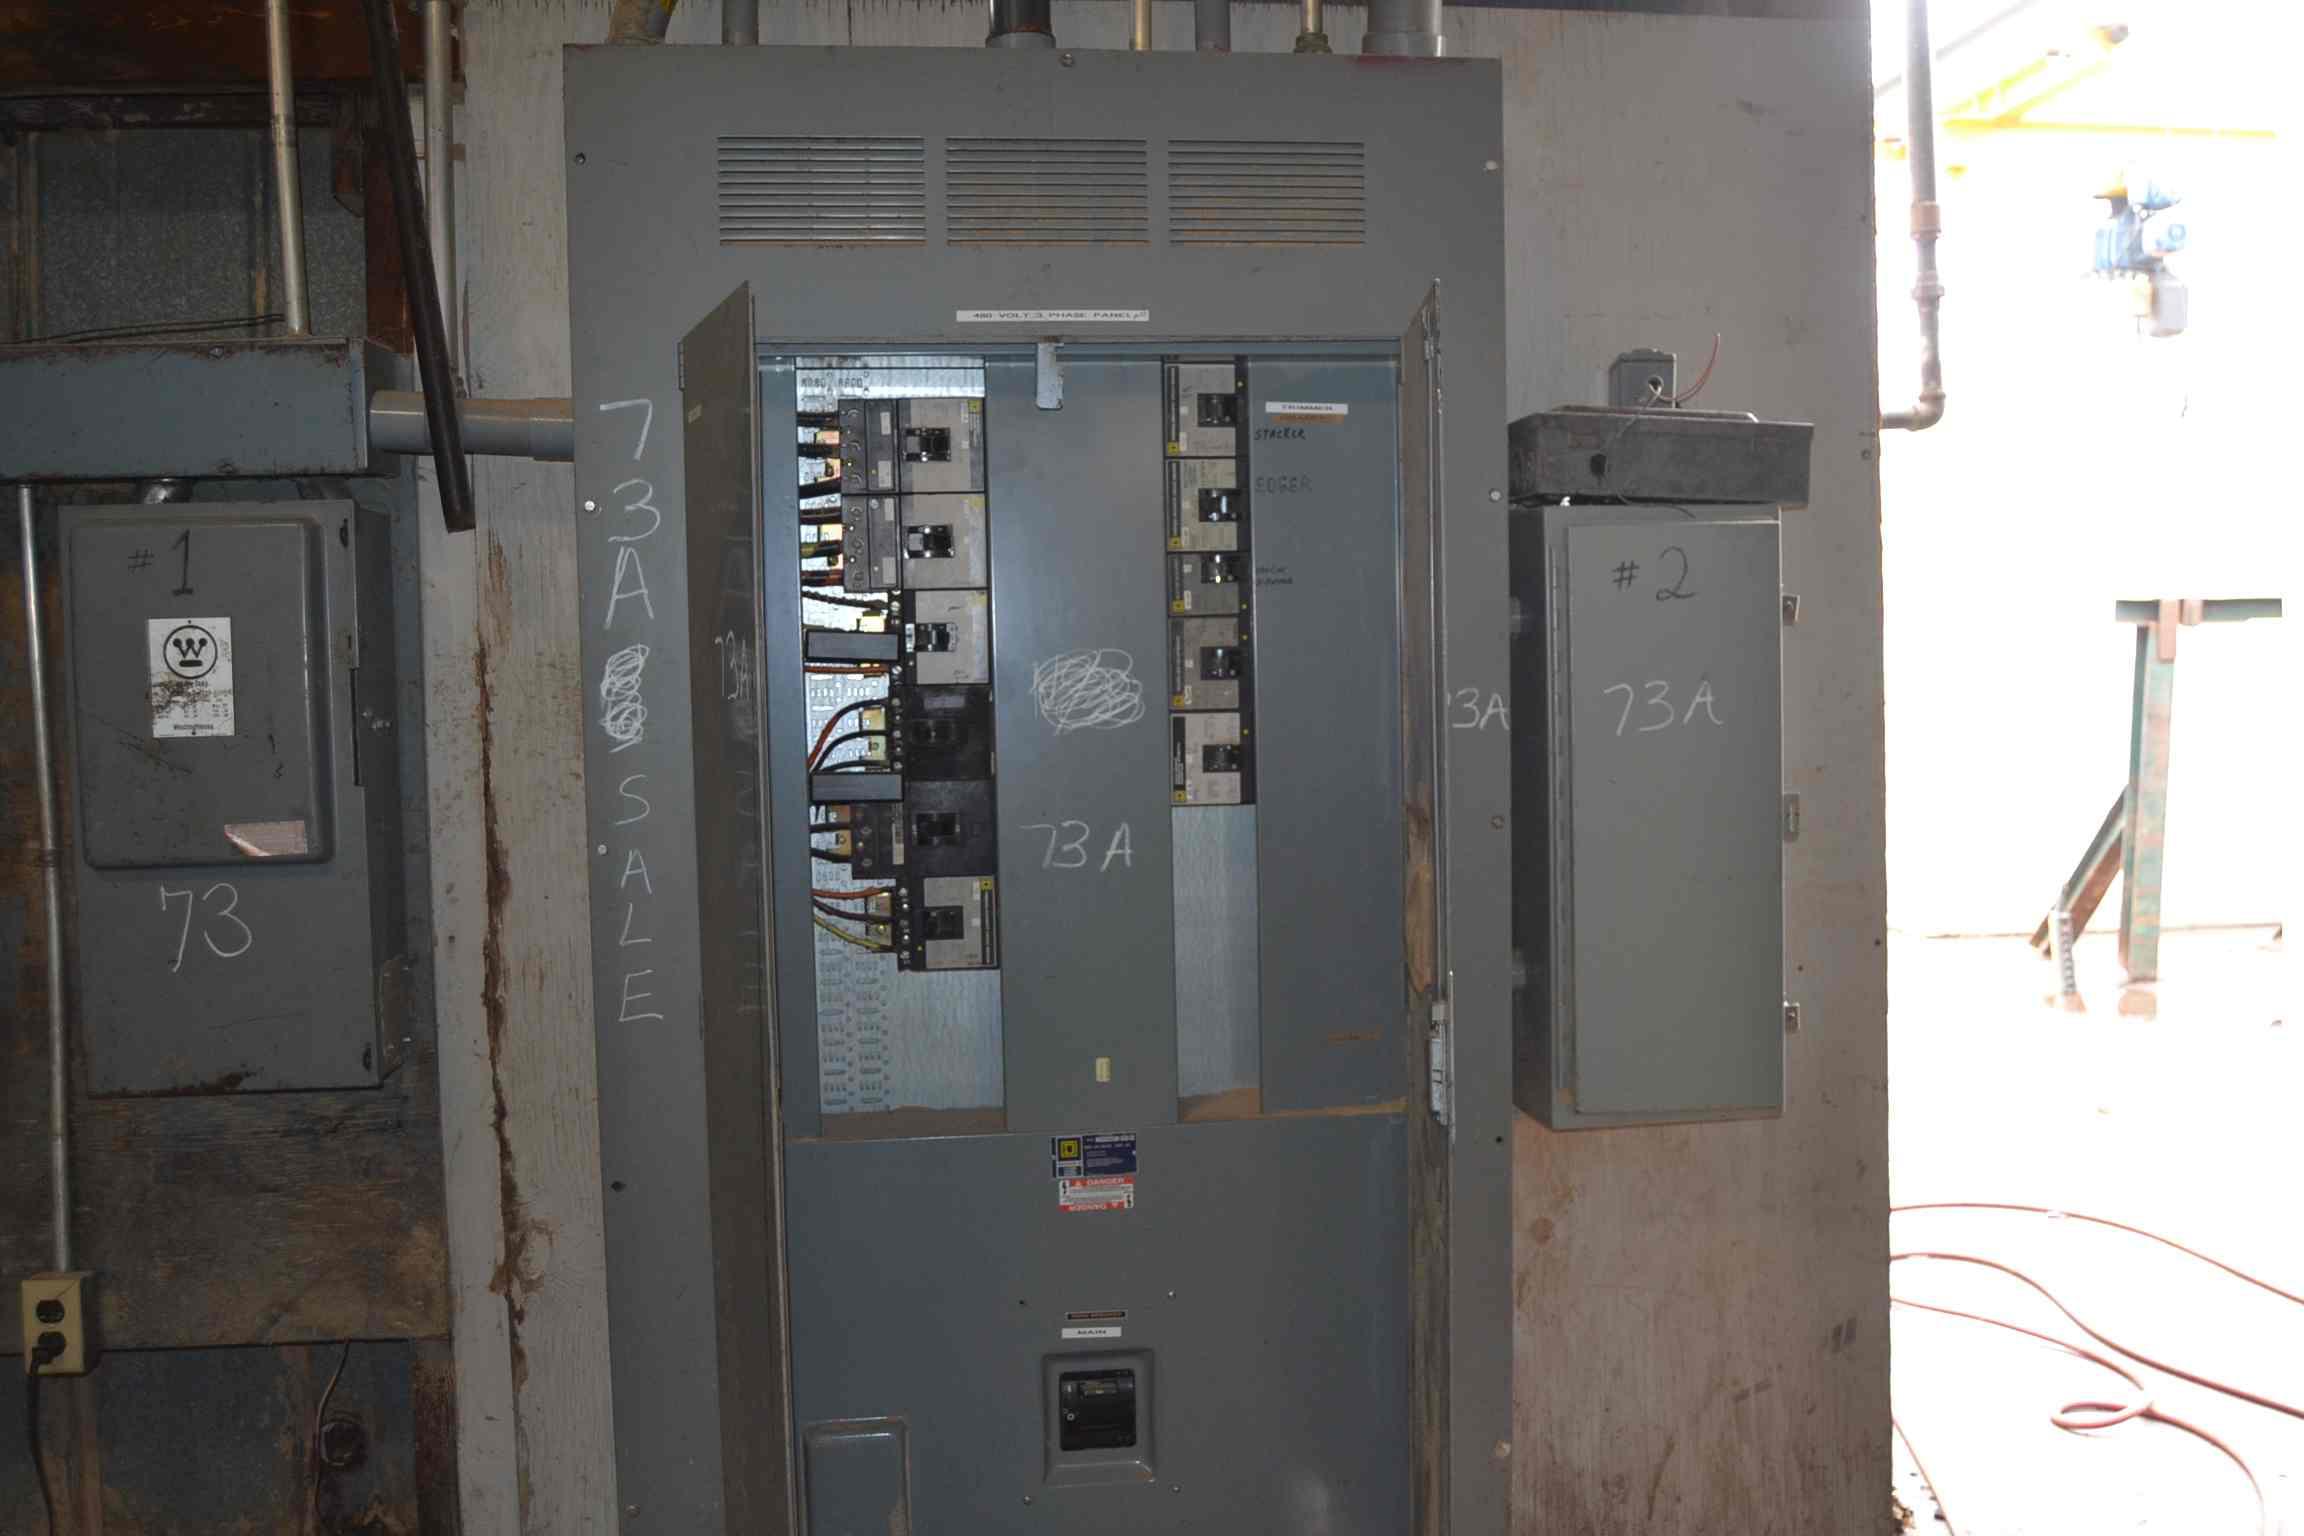 Square d 800 amp i line panel board lot 73a square d 800 amp i line panel board sciox Images